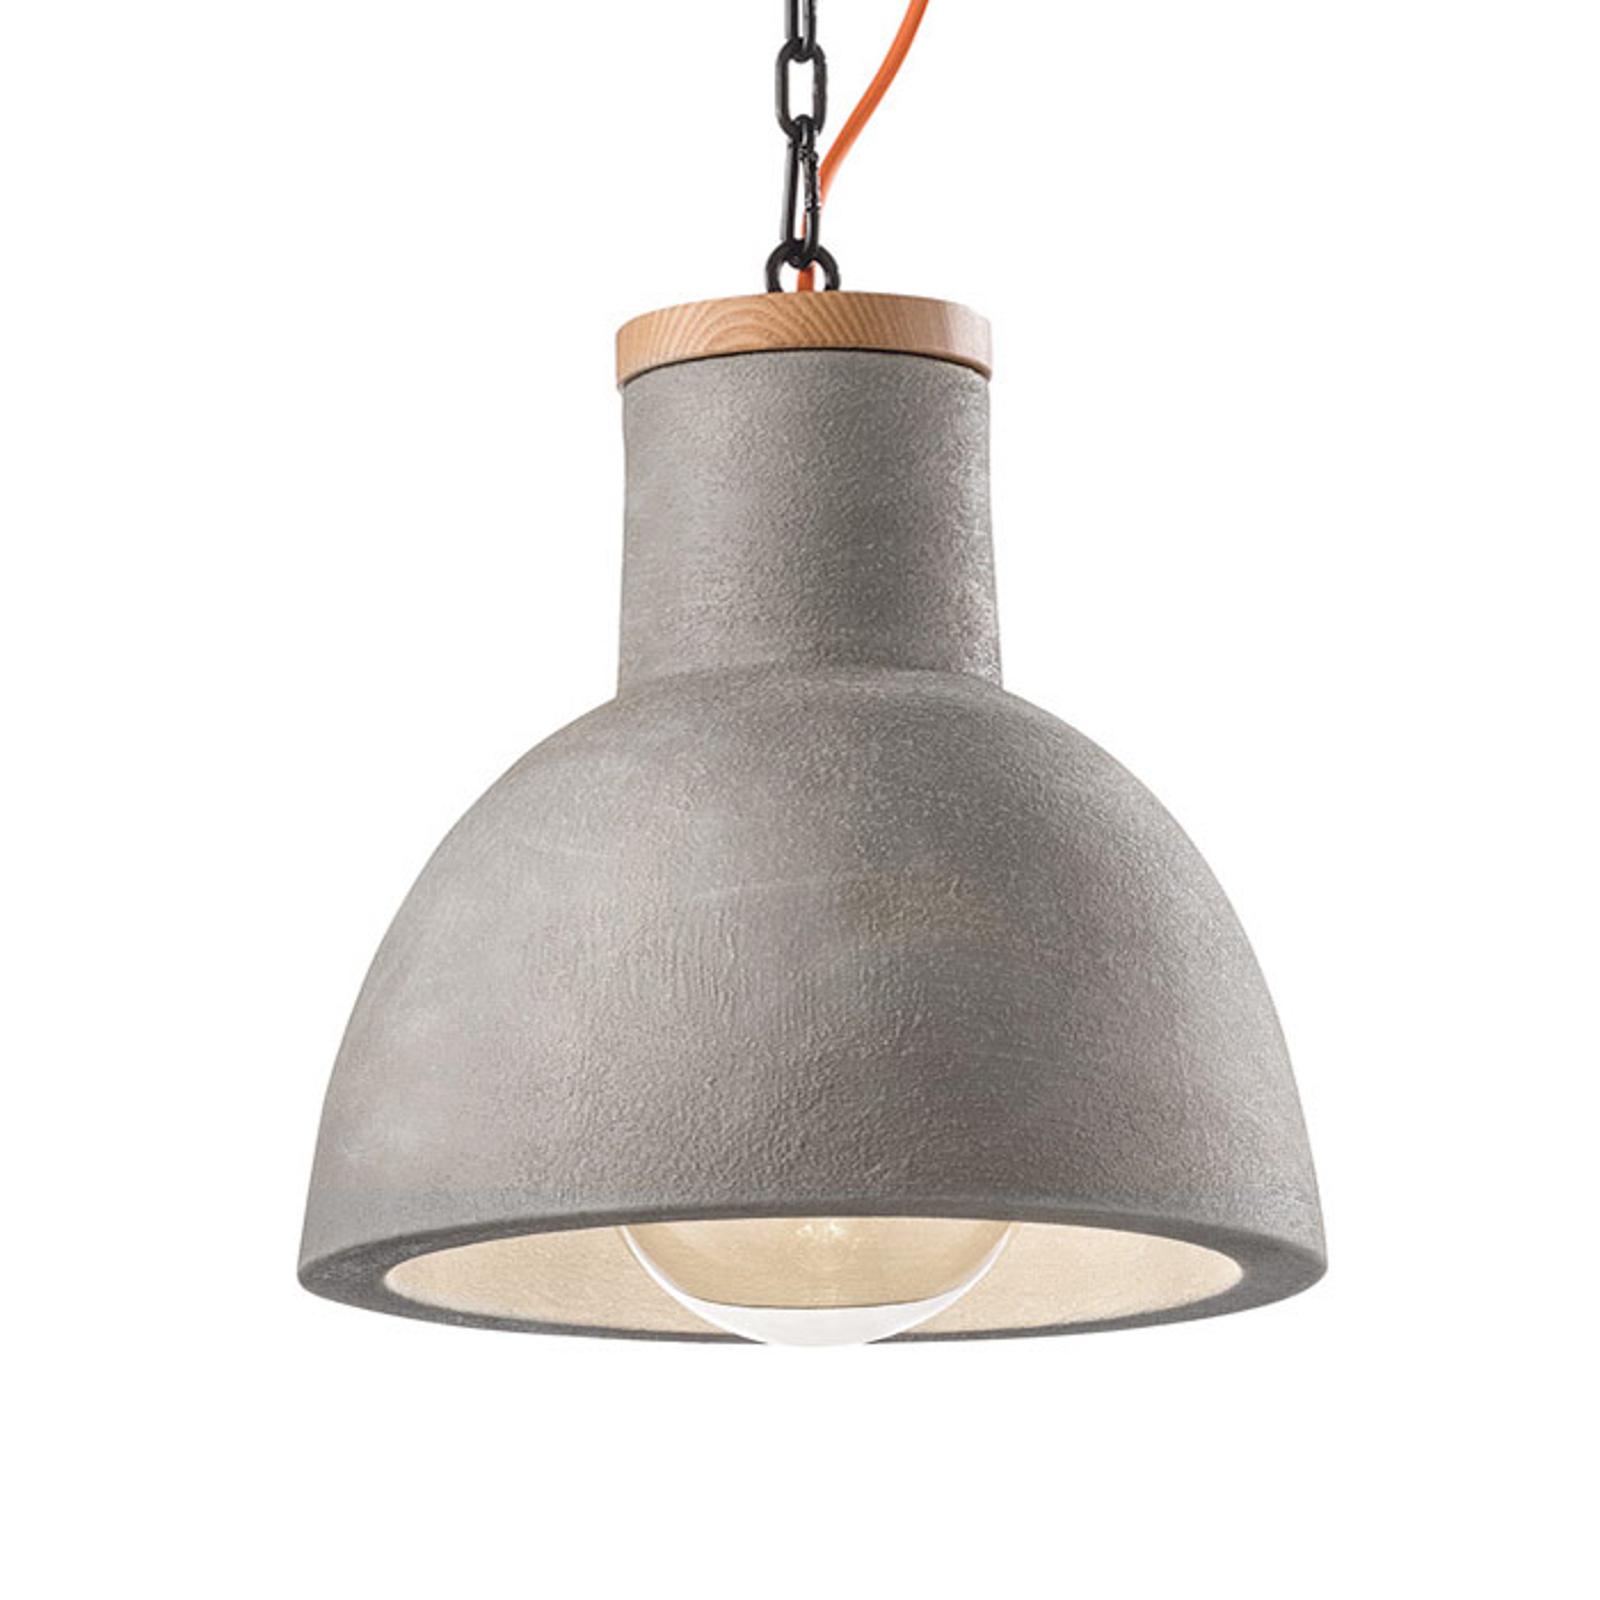 Lampada a sospensione C1781 scandinava, cemento